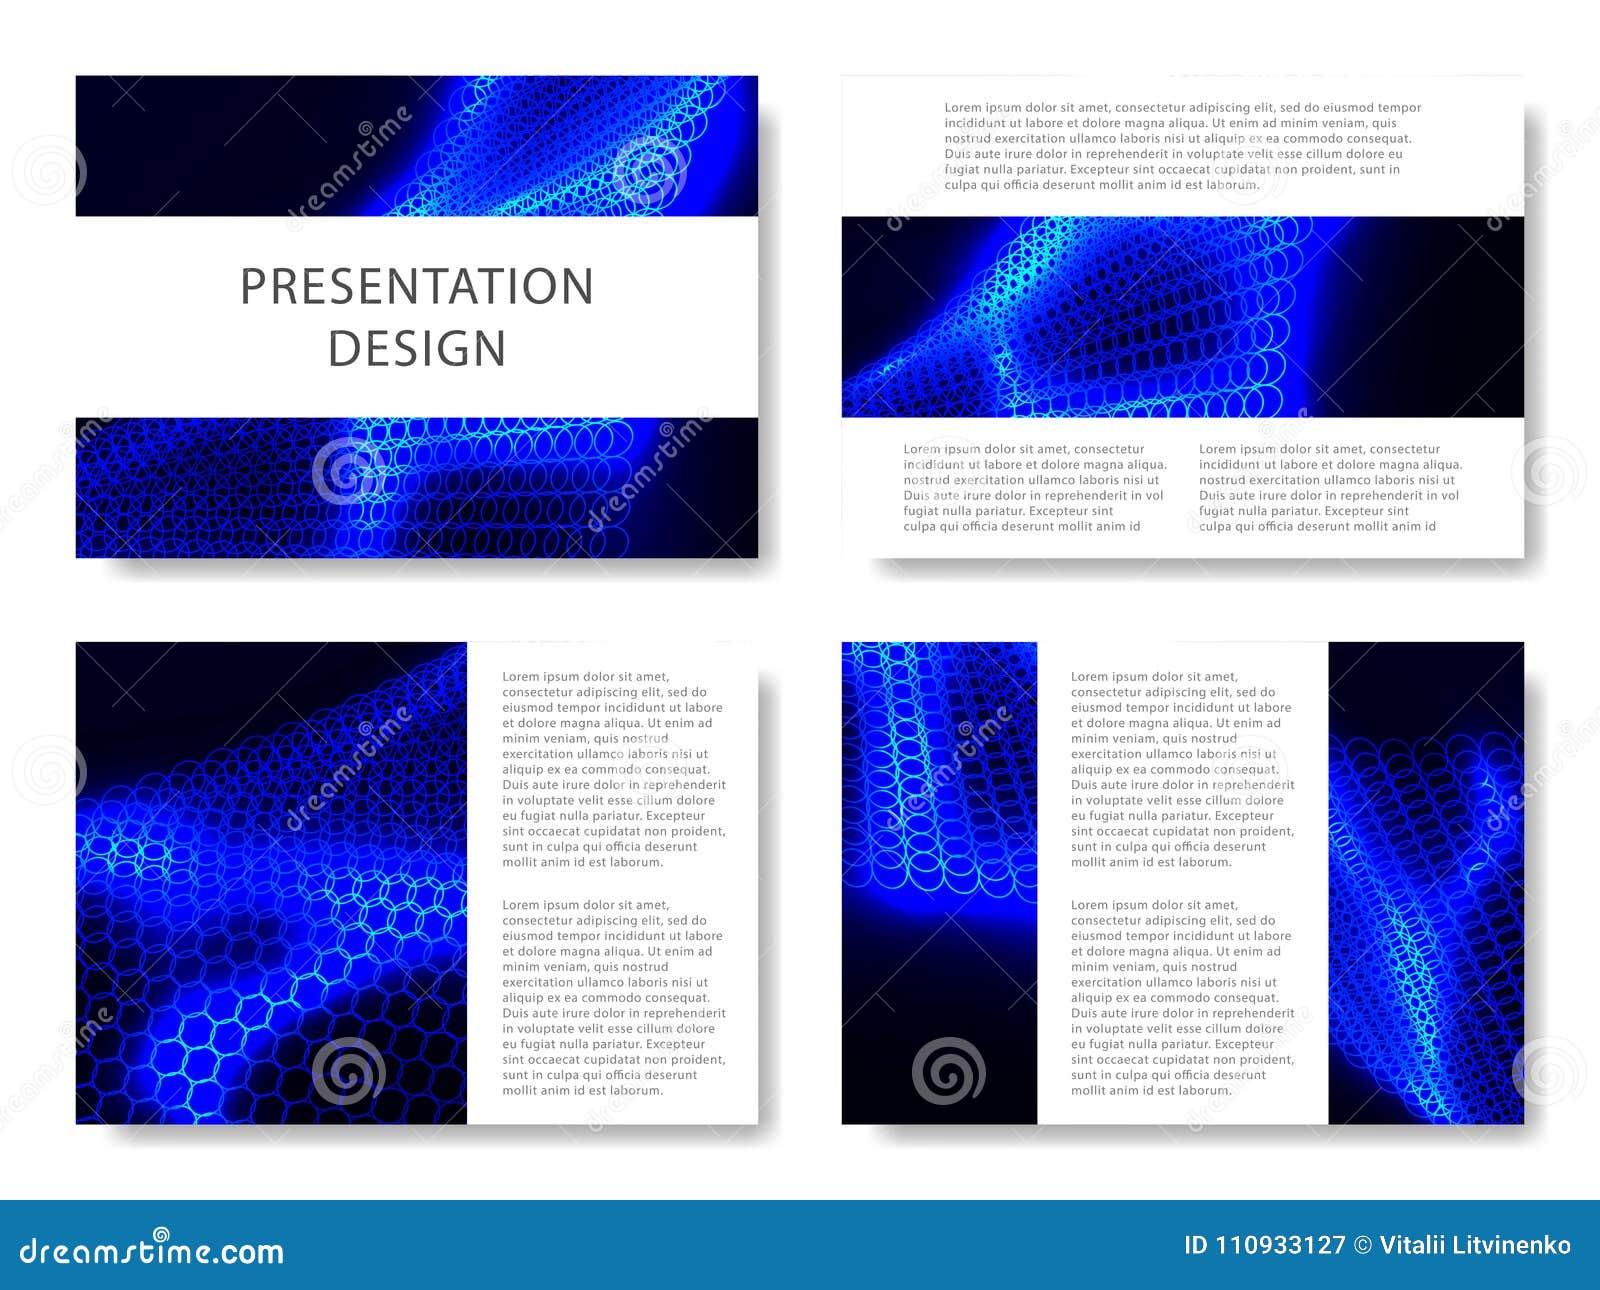 Fondos para diapositivas hermosas